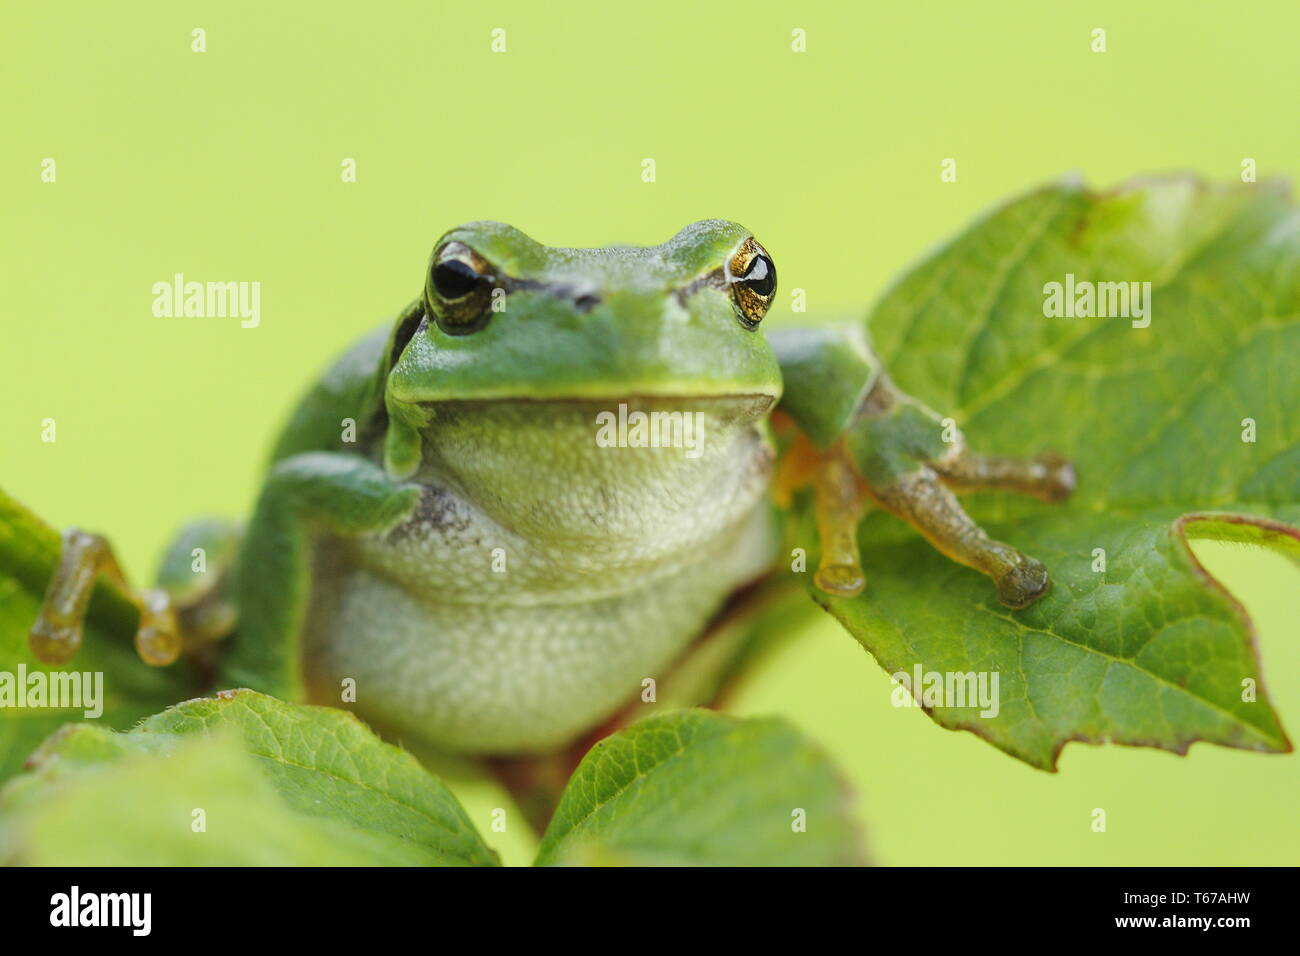 European tree frog, Hyla arborea - Stock Image